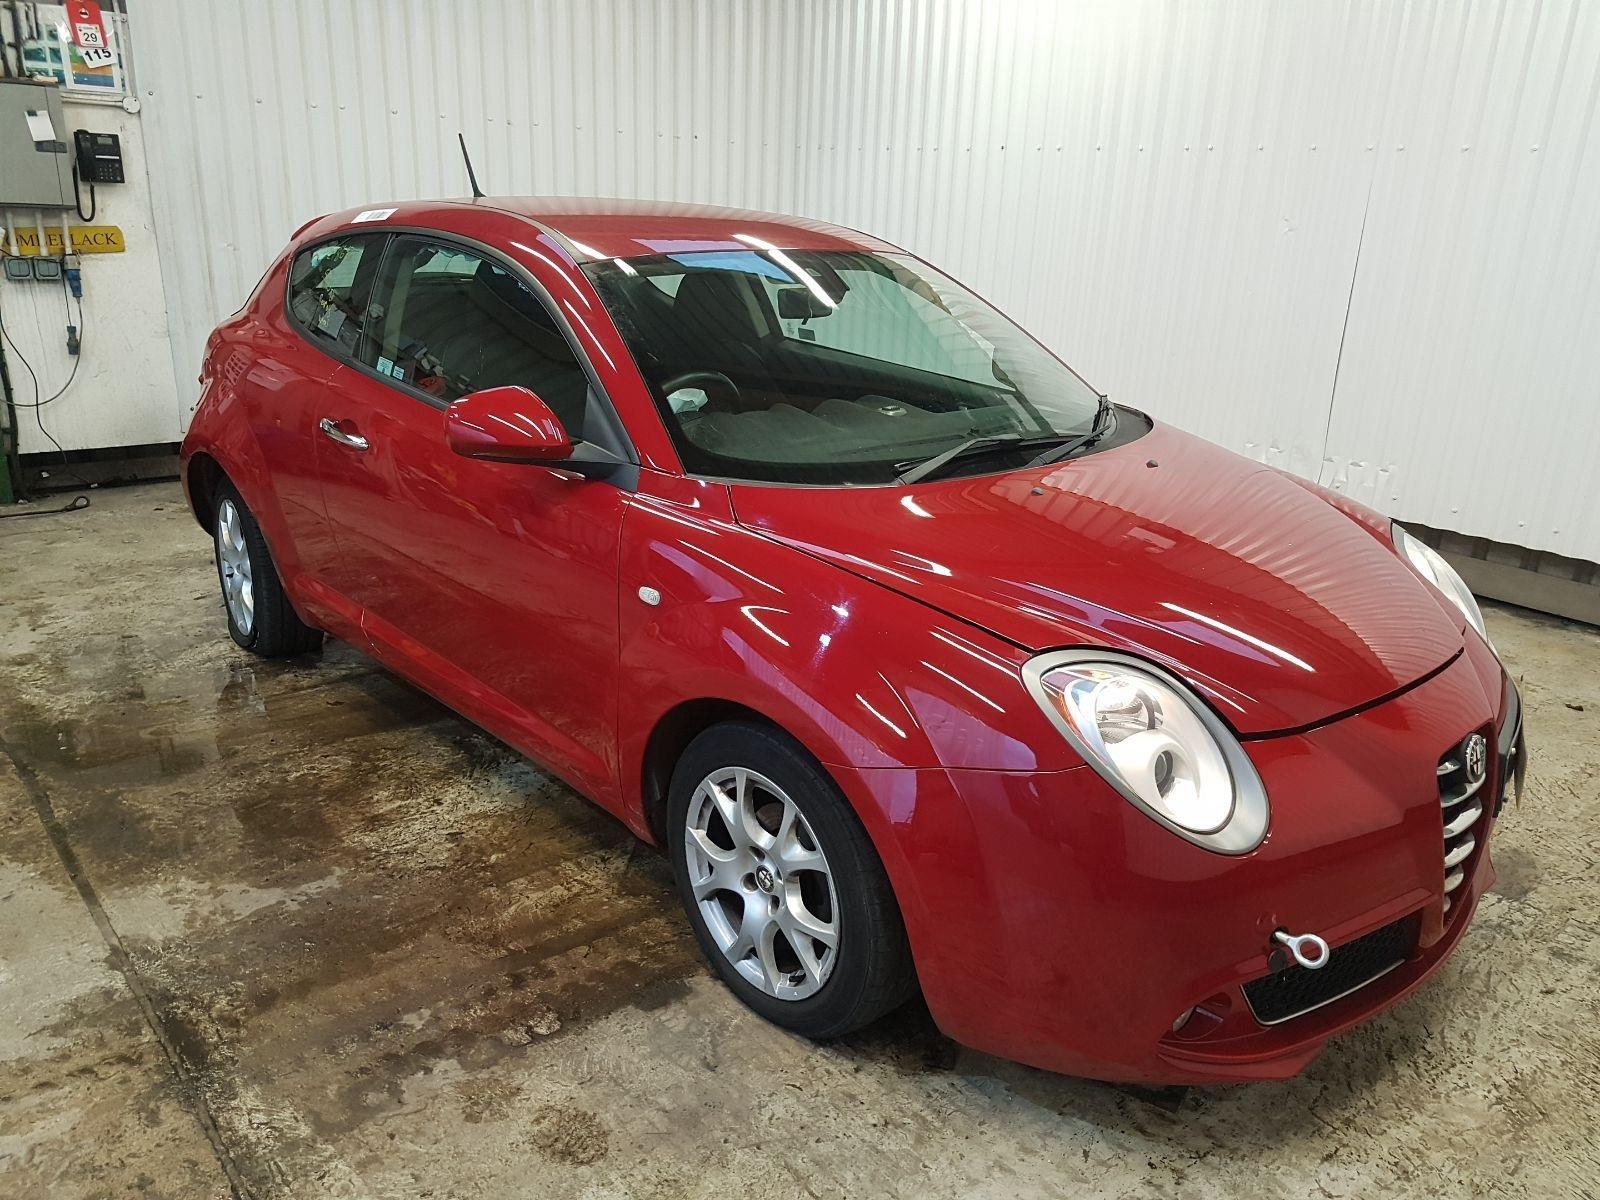 Alfa Romeo MiTo 2008 To 2016 Sprint 3 Door Hatchback